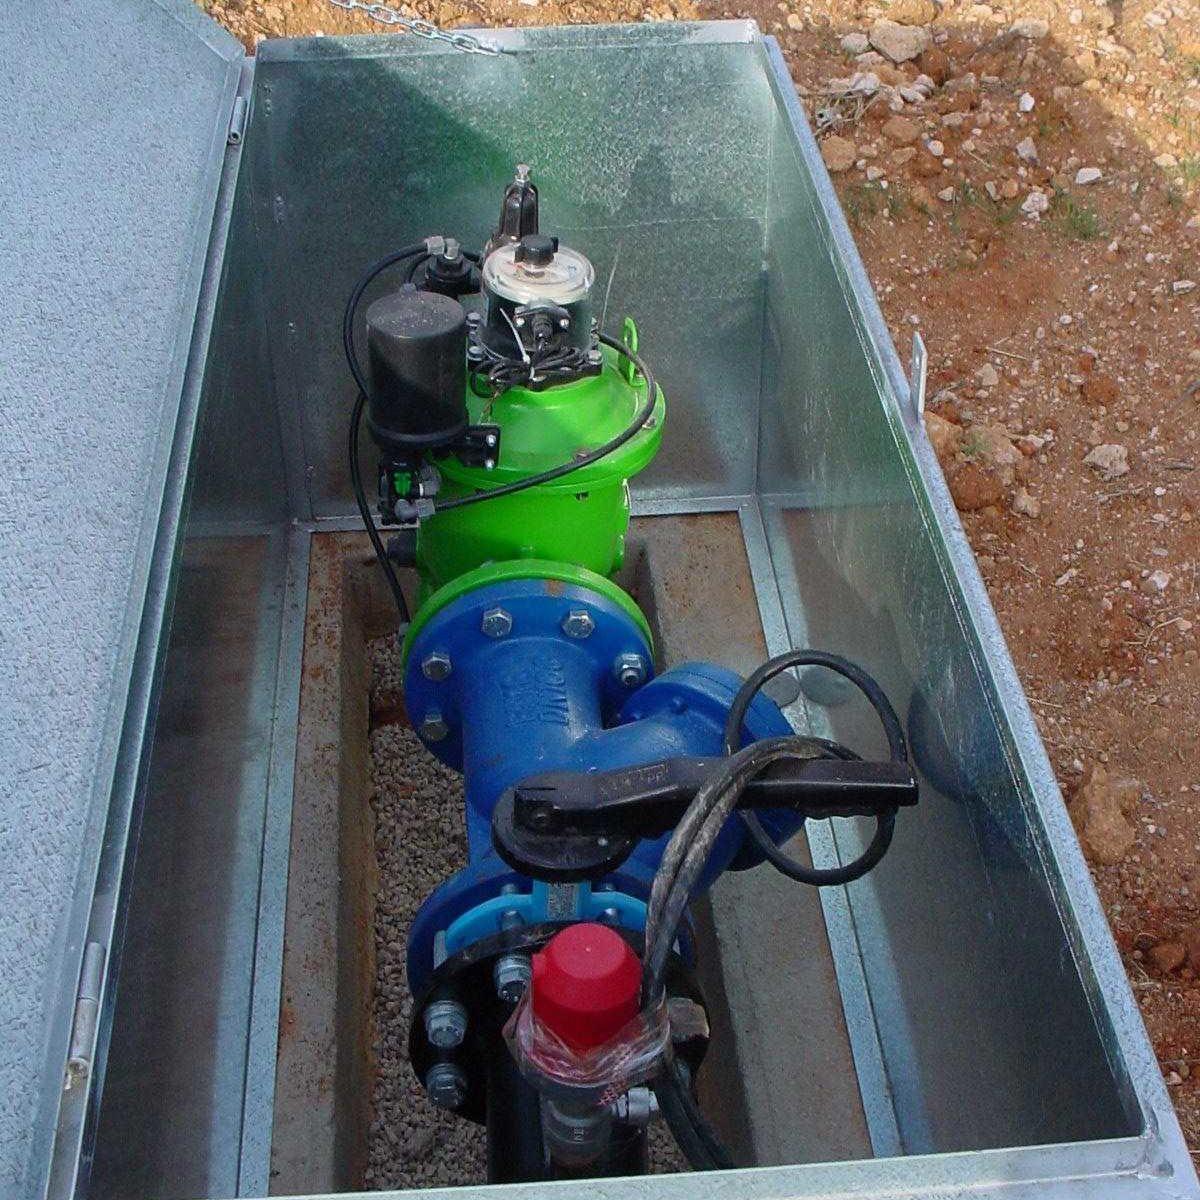 CASETA CONTADOR - valvula hidrauliuca contadora,reguladora de presion automatizada - filtro cazapiedra